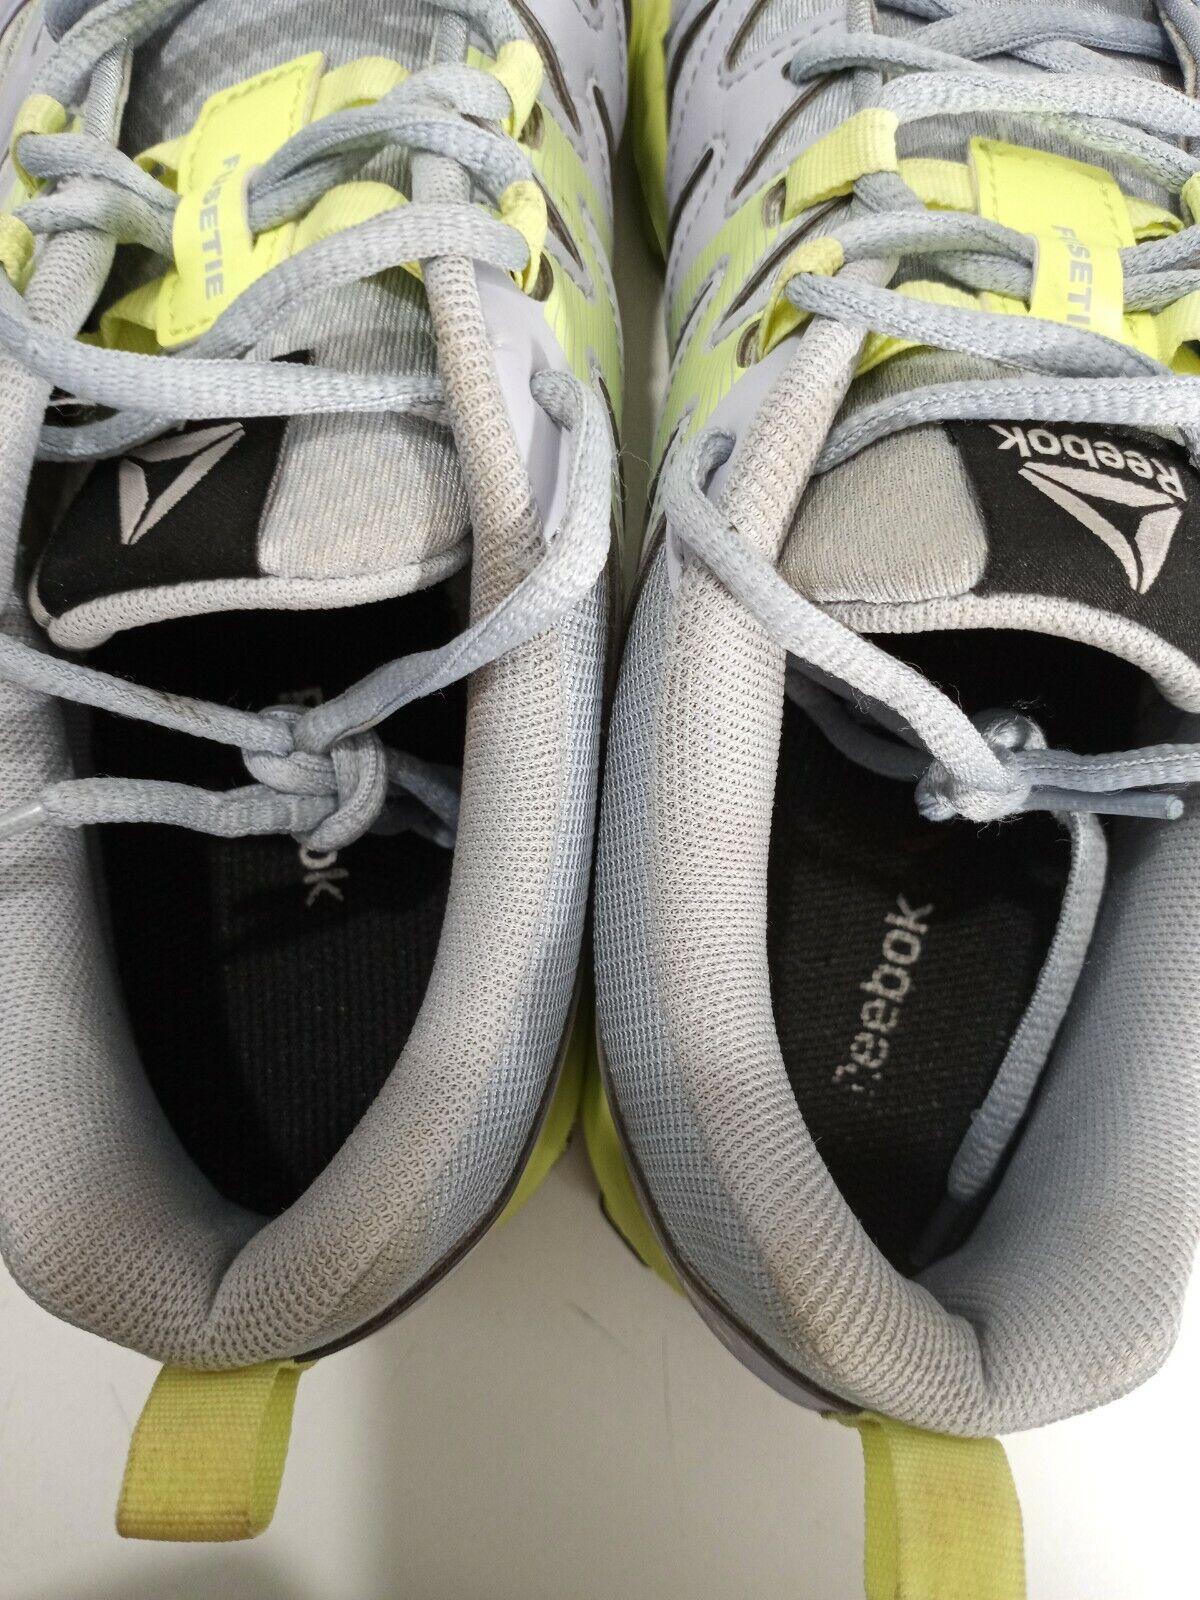 Reebok Femme Realflex Train 4.0 AR3054 Gris Jaune Chaussures De Course Taille 10